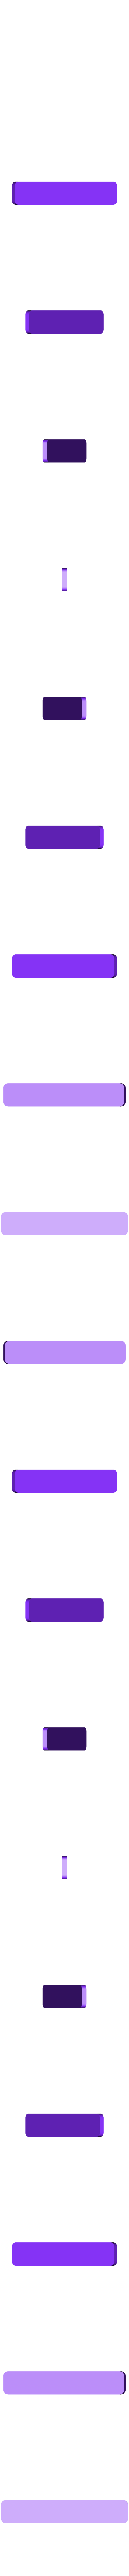 Support-3troux.stl Download free STL file Modular reminder • 3D print template, rfbat